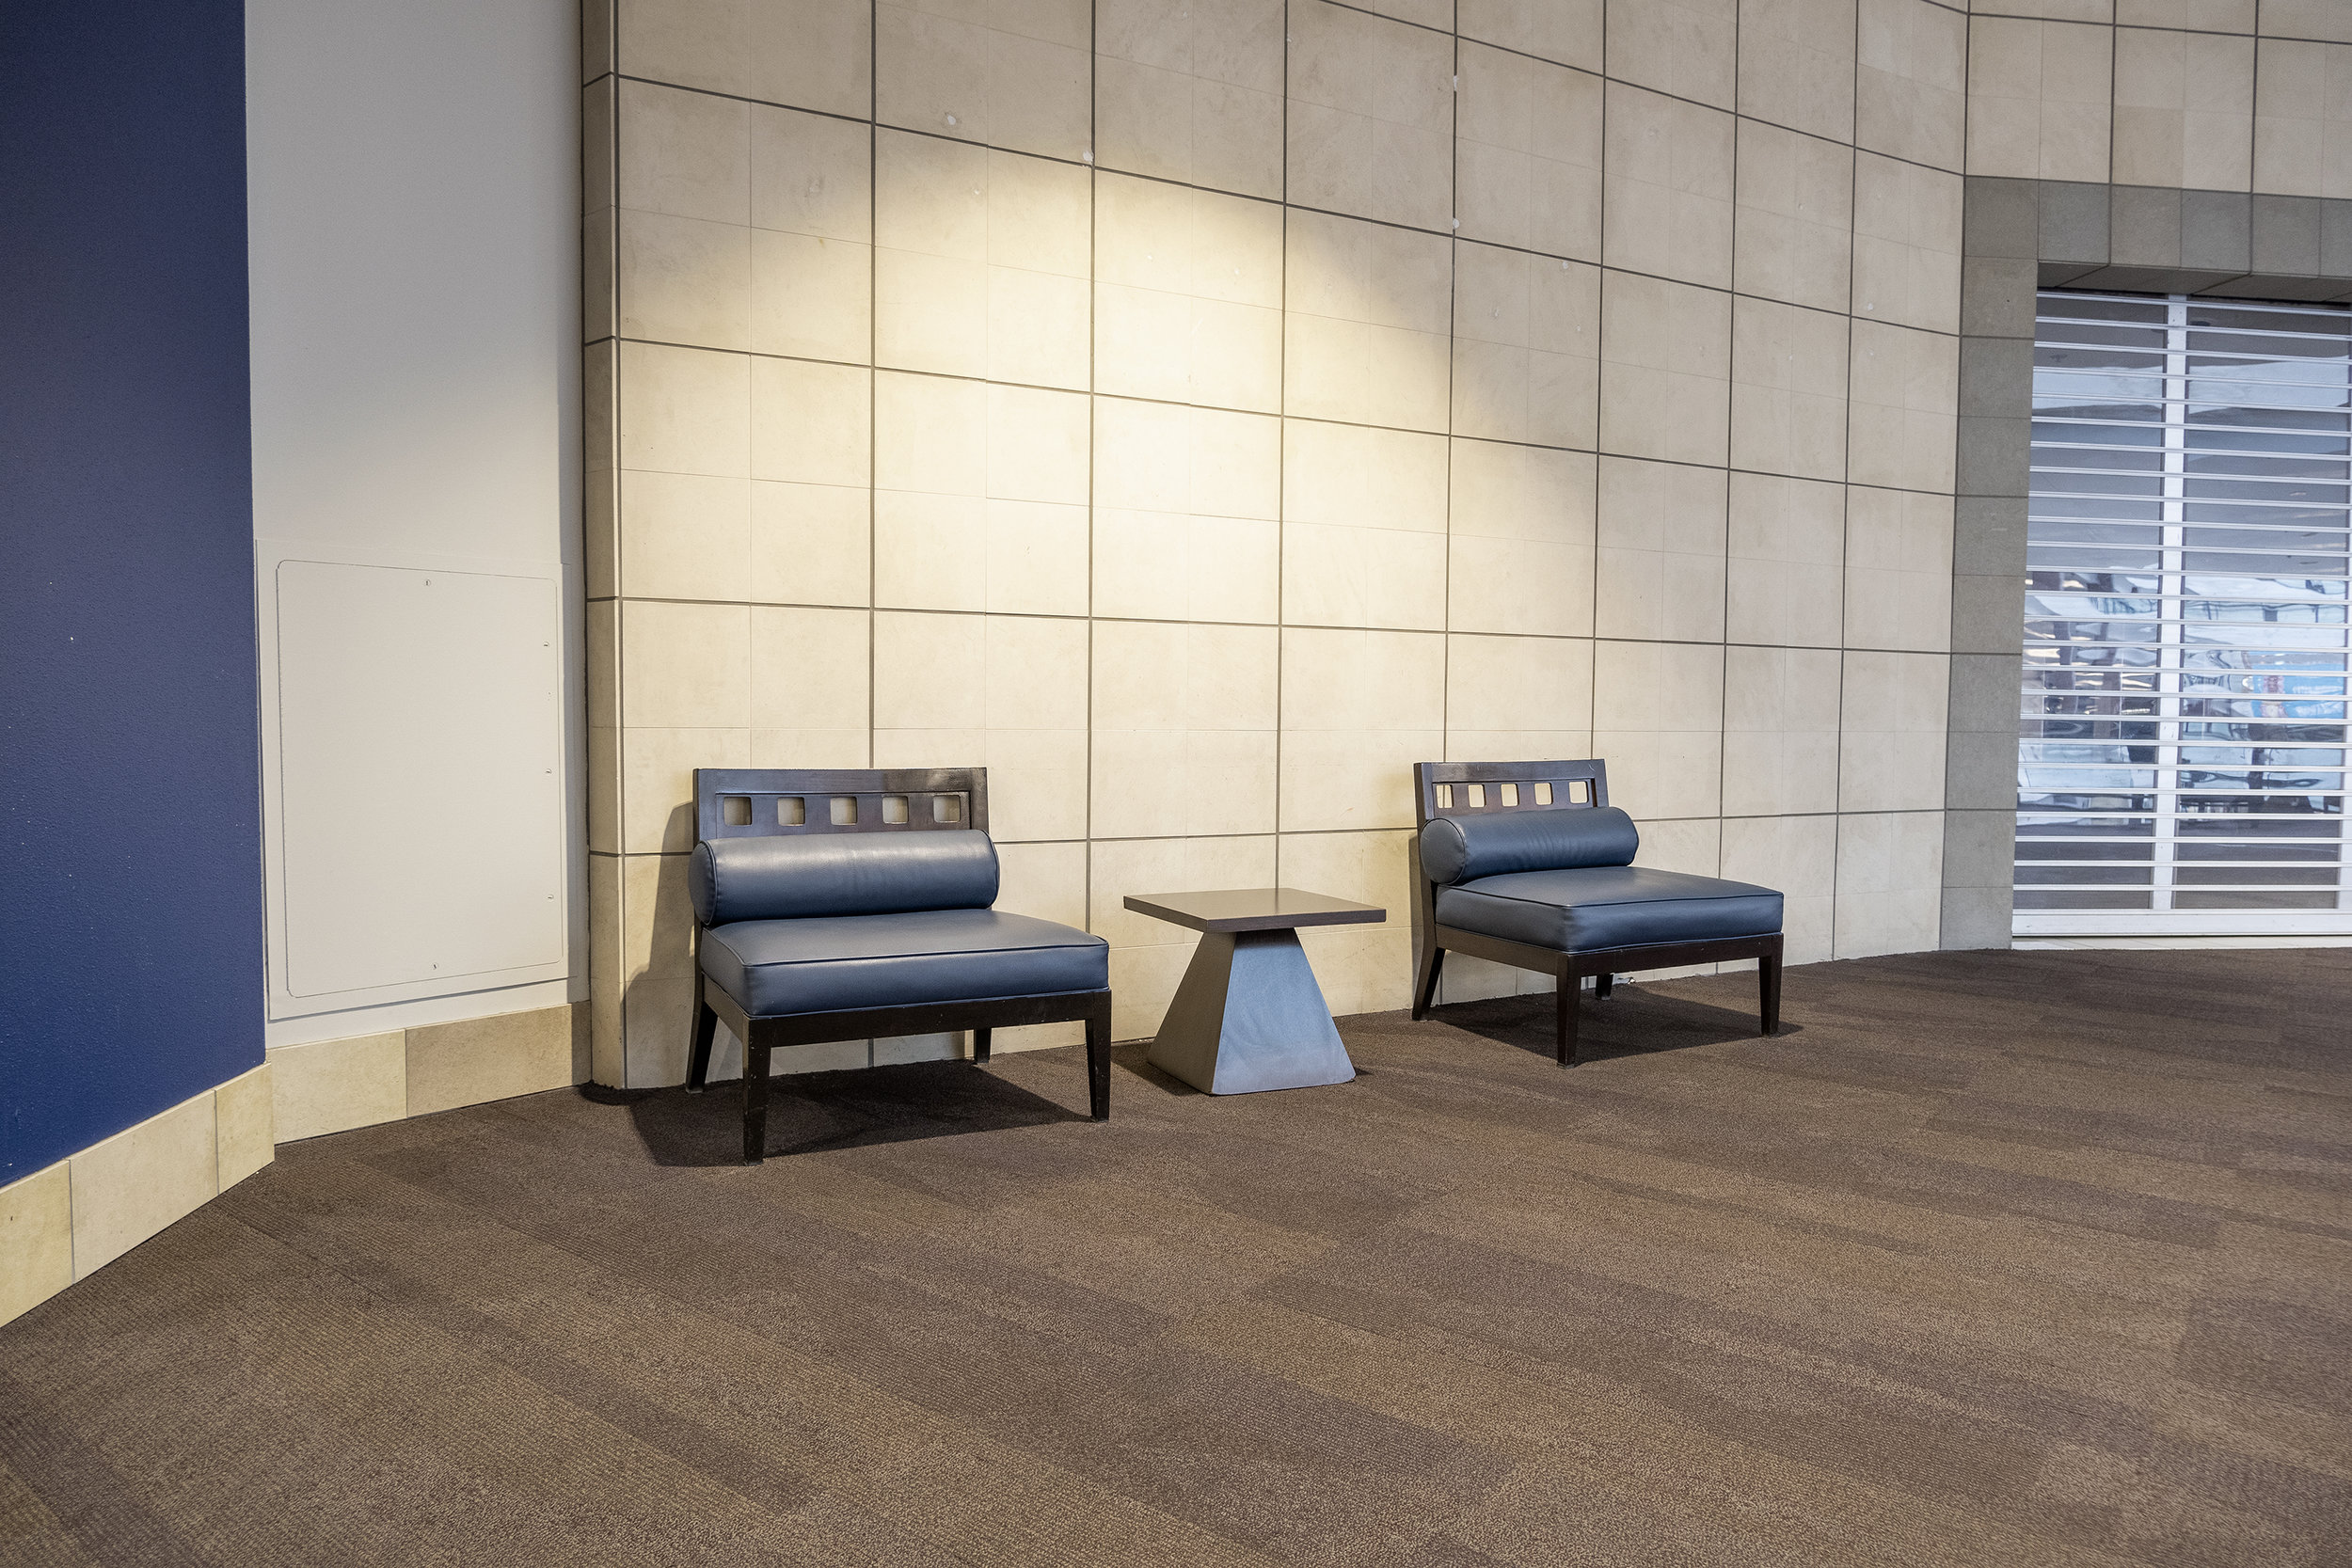 Interior chairs - Lloyd Center Mall - Nathaniel Barber Blog